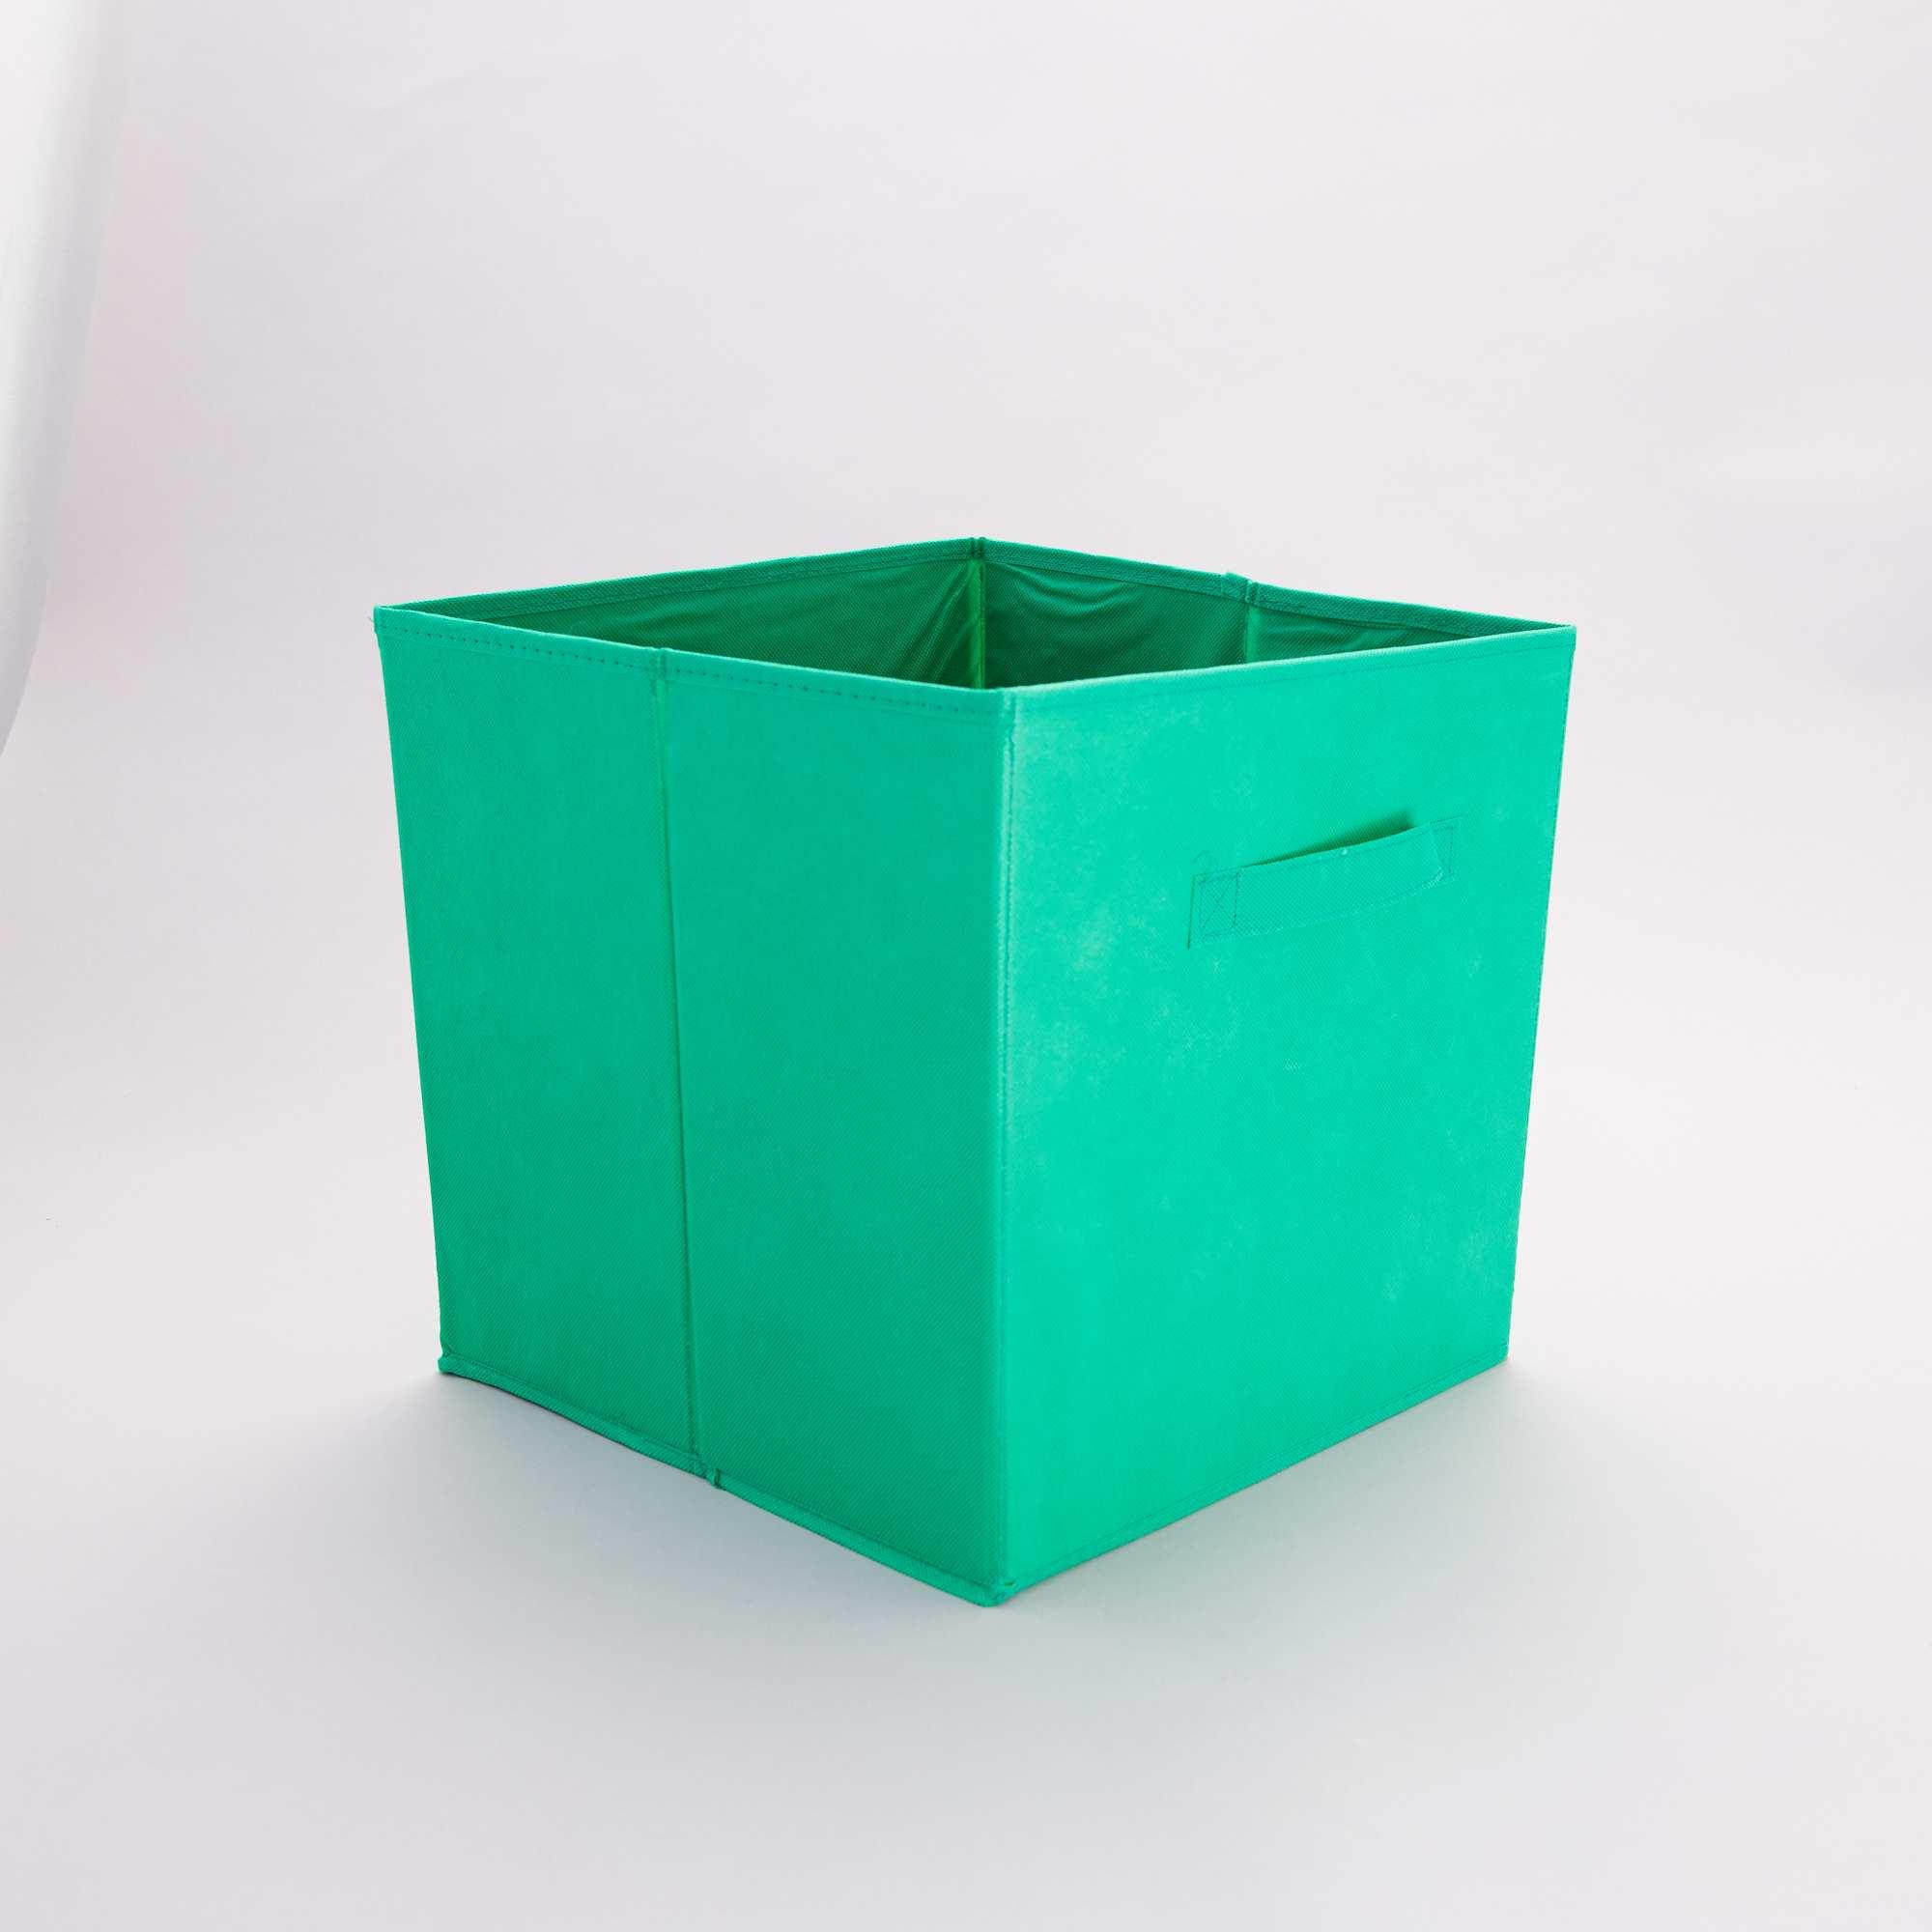 panier pliable intiss linge de lit vert emeraude kiabi 4 00. Black Bedroom Furniture Sets. Home Design Ideas